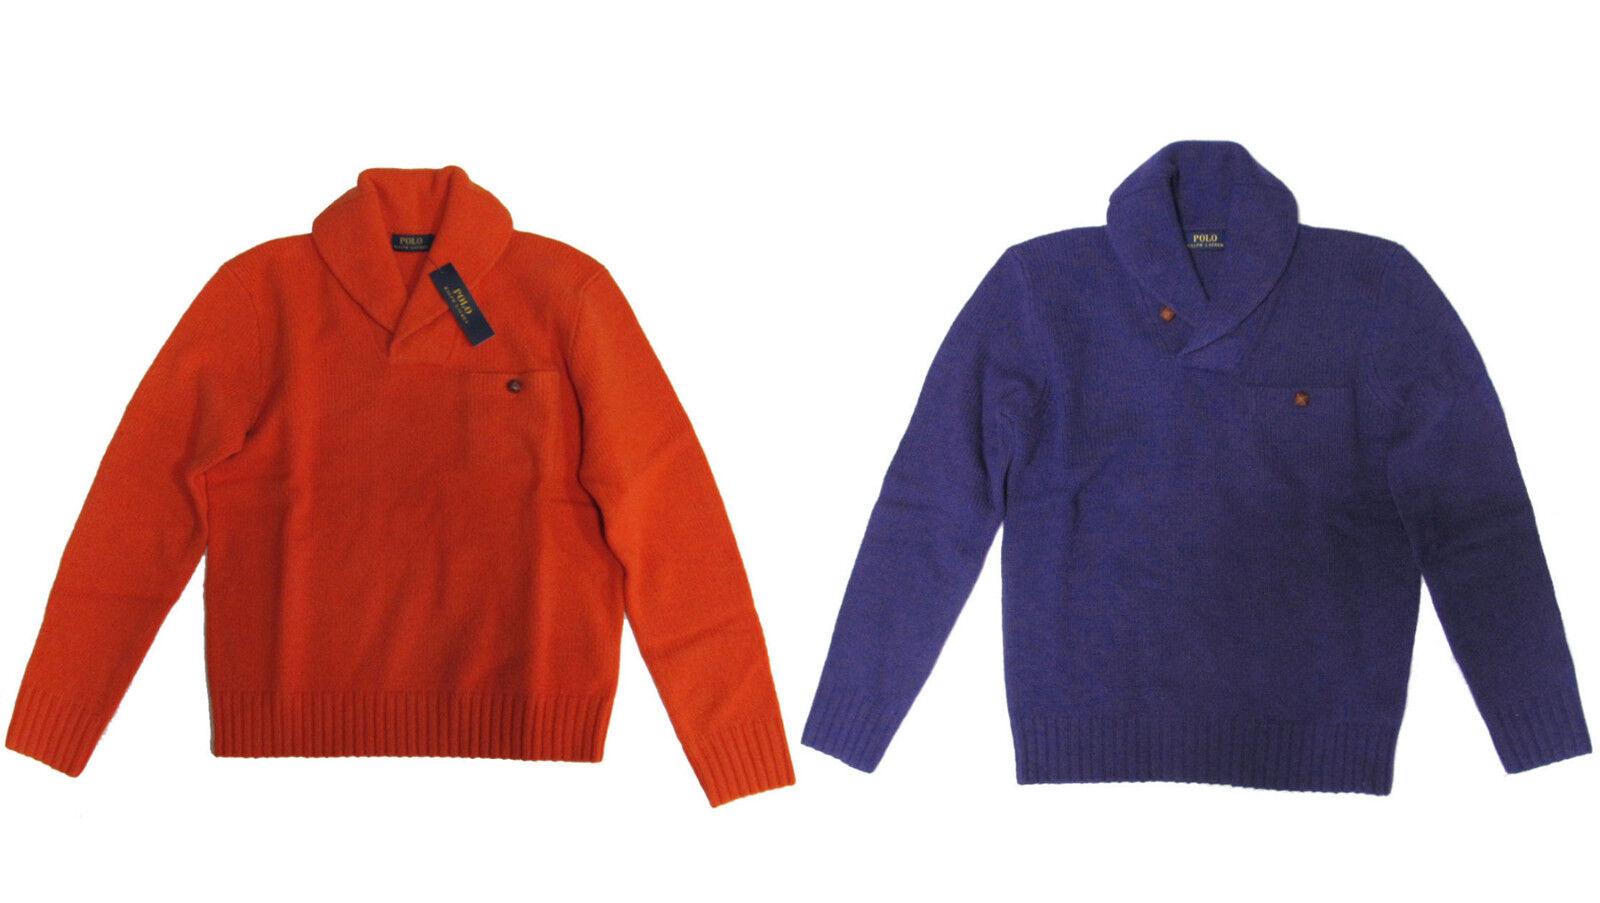 Polo Ralph Lauren  Herren Heavy Wool Angora Knit Shawl Collar Leder Sweater New